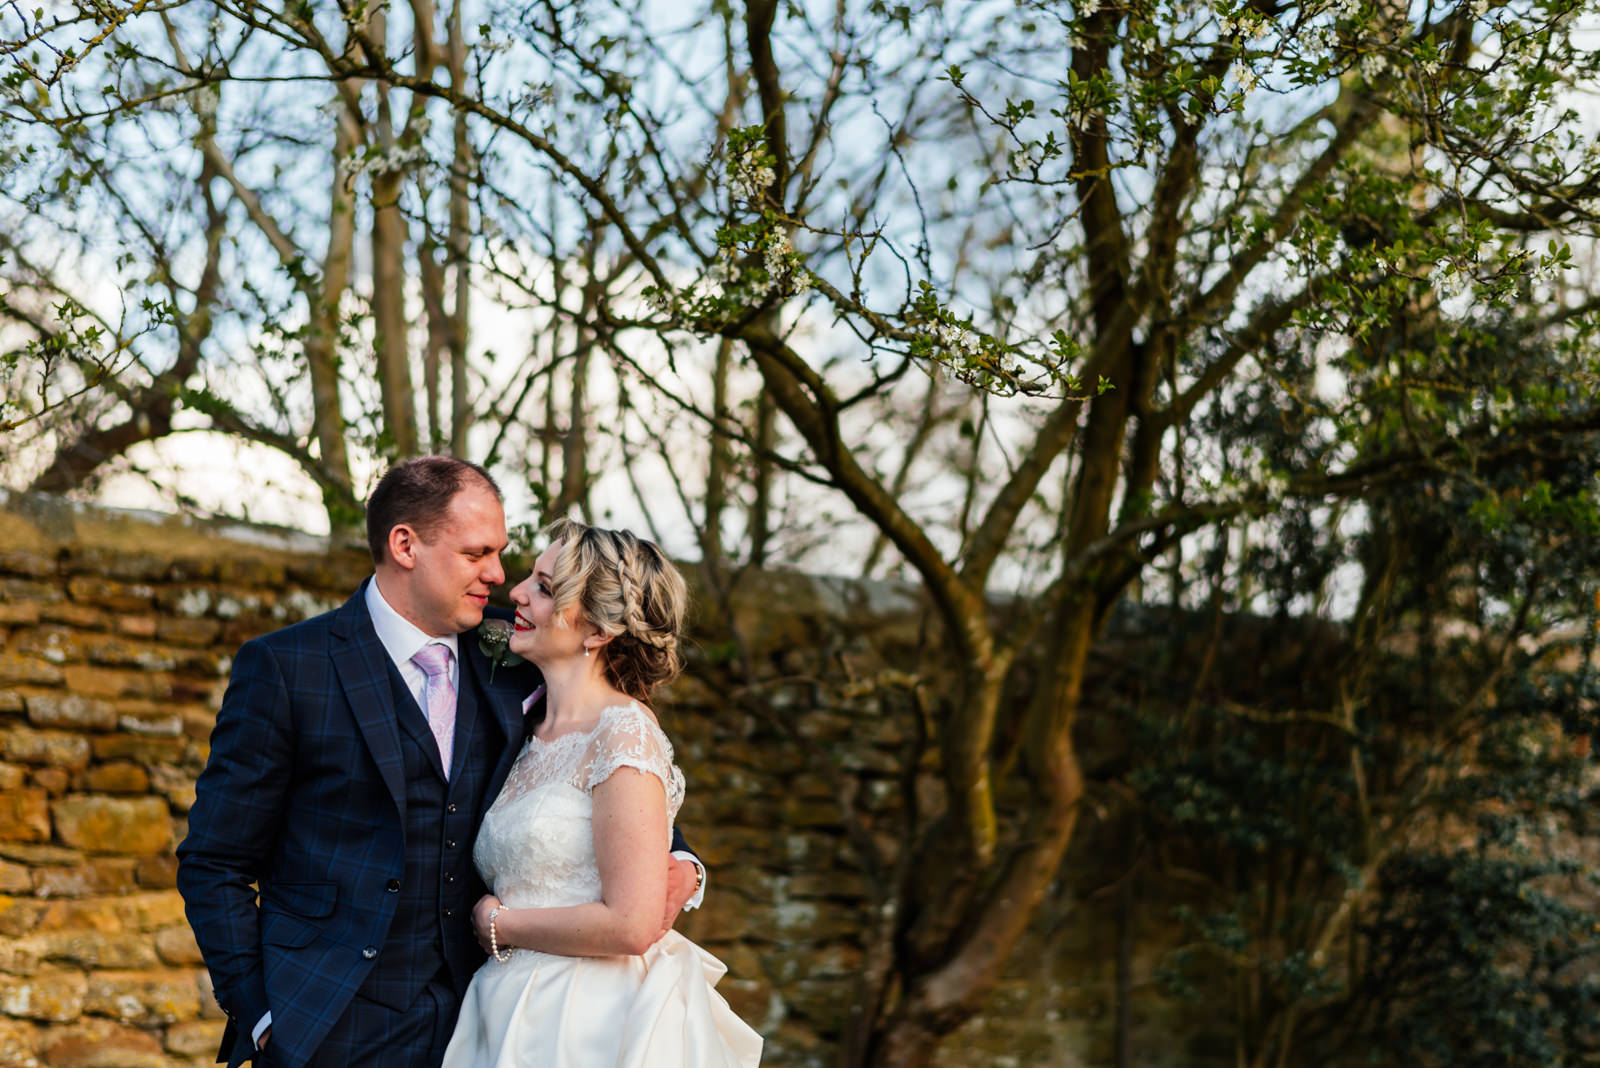 dodford manor wedding portrait